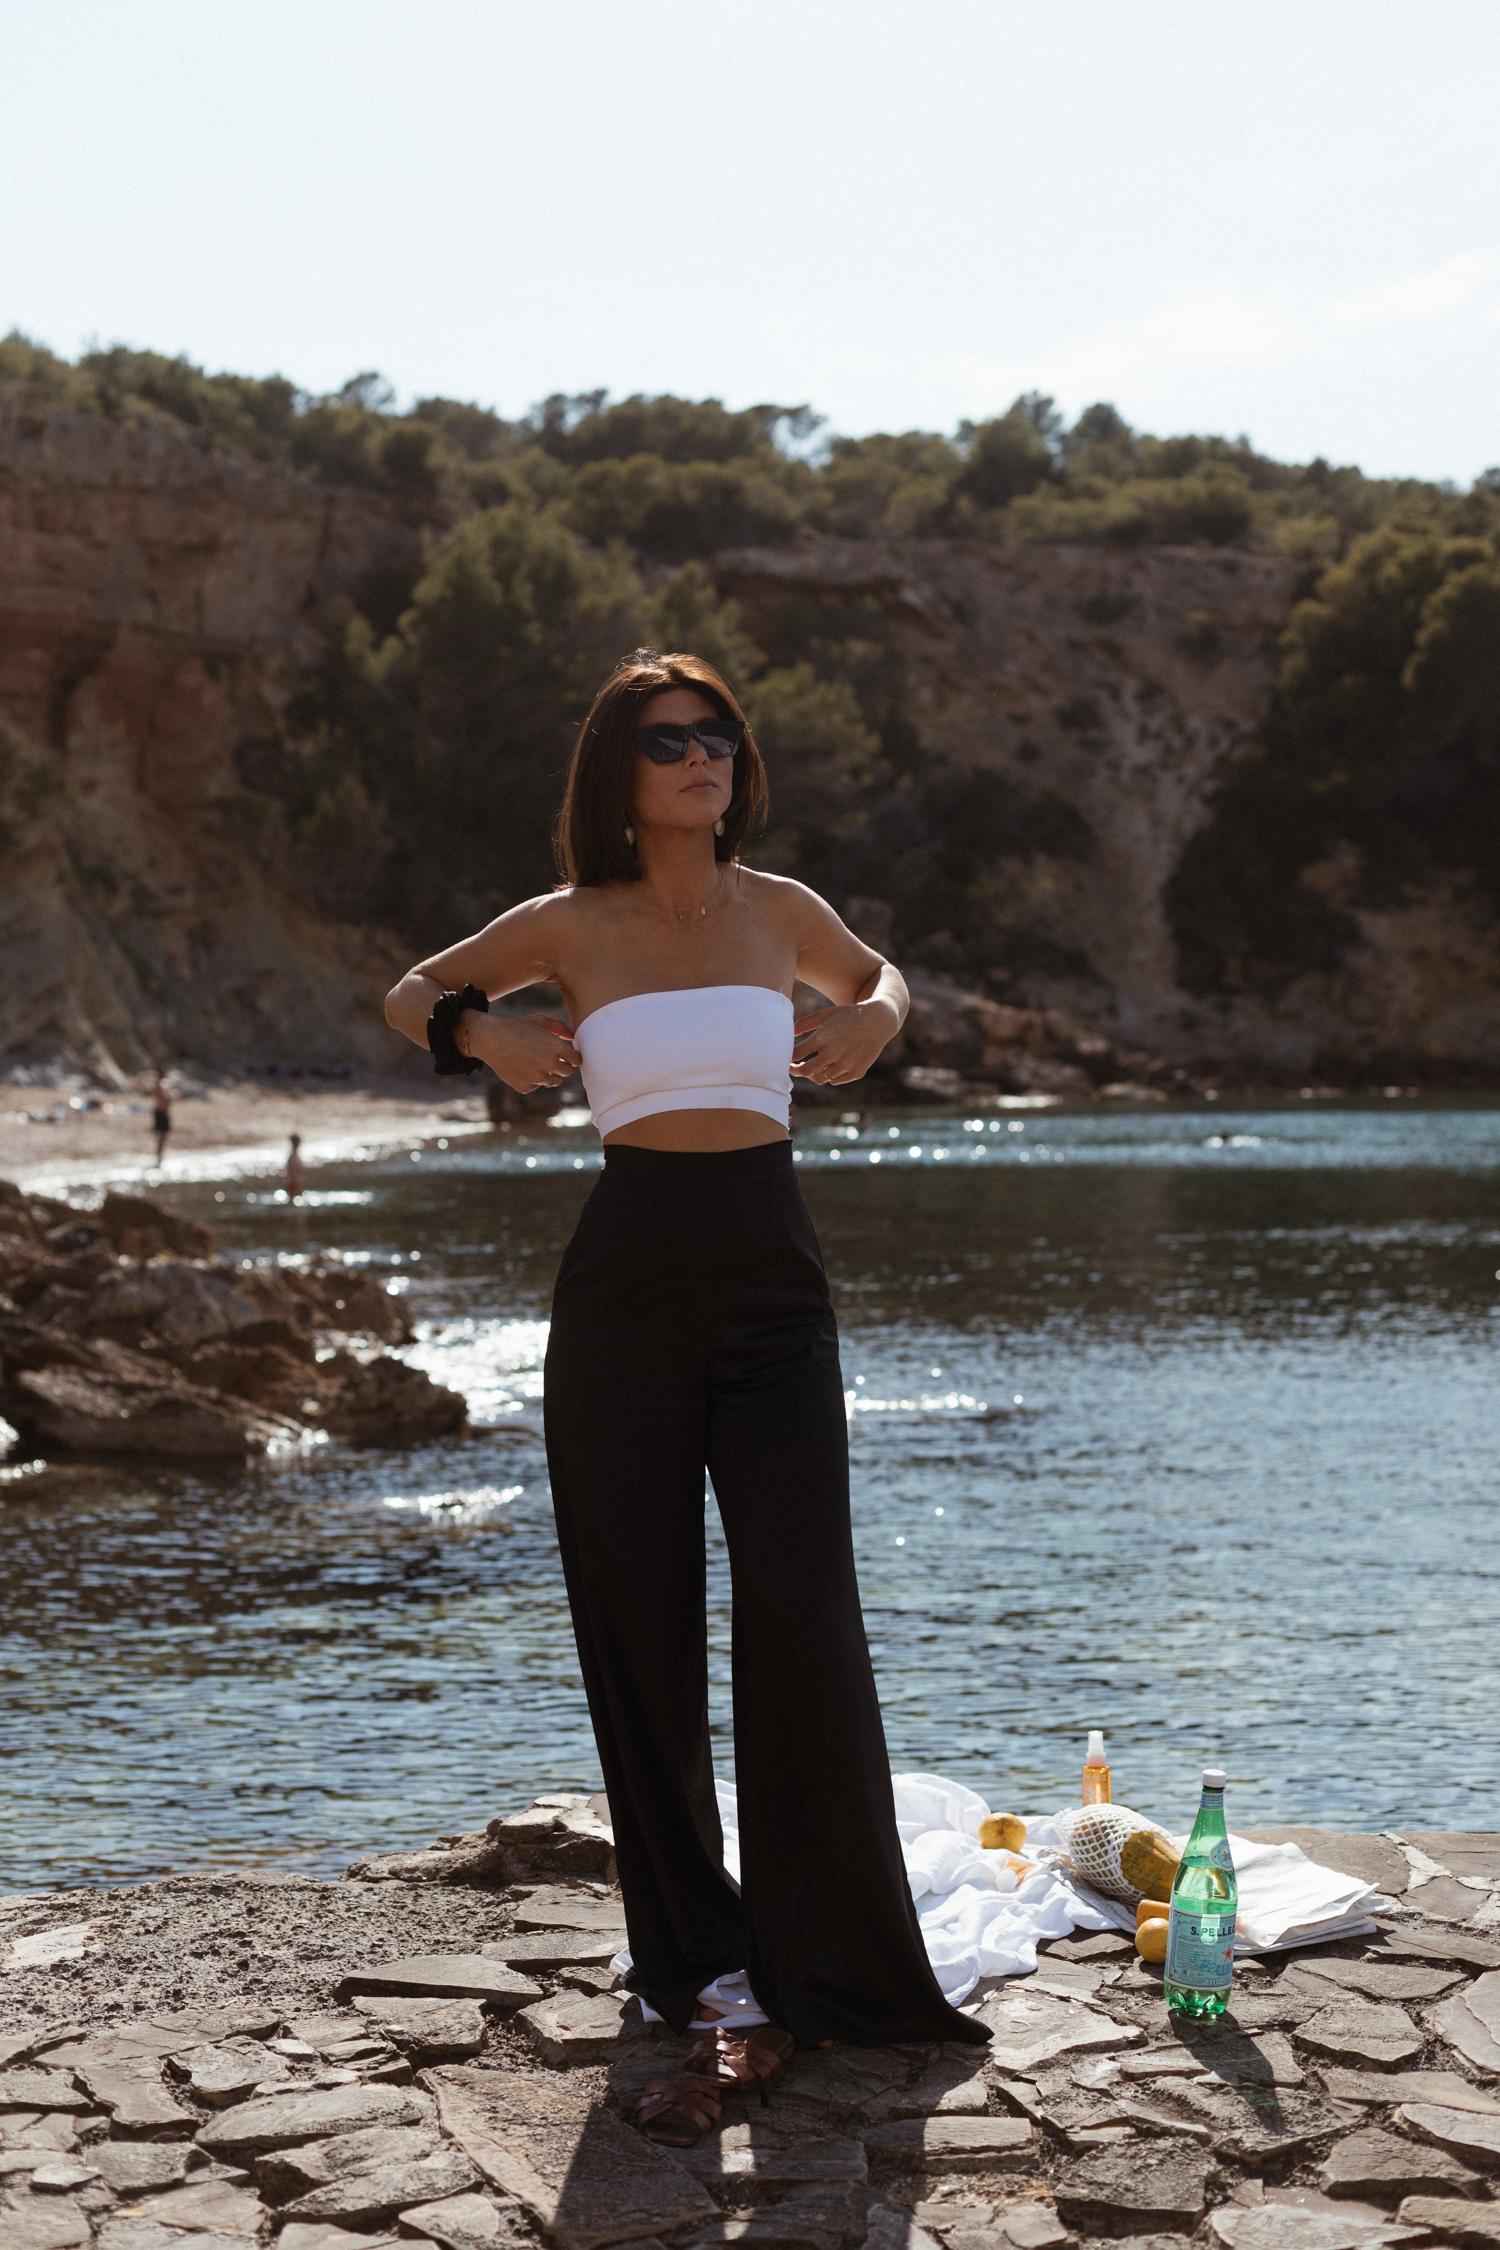 Caudalie Suncare + Ocean Protect - Bikinis & Passports